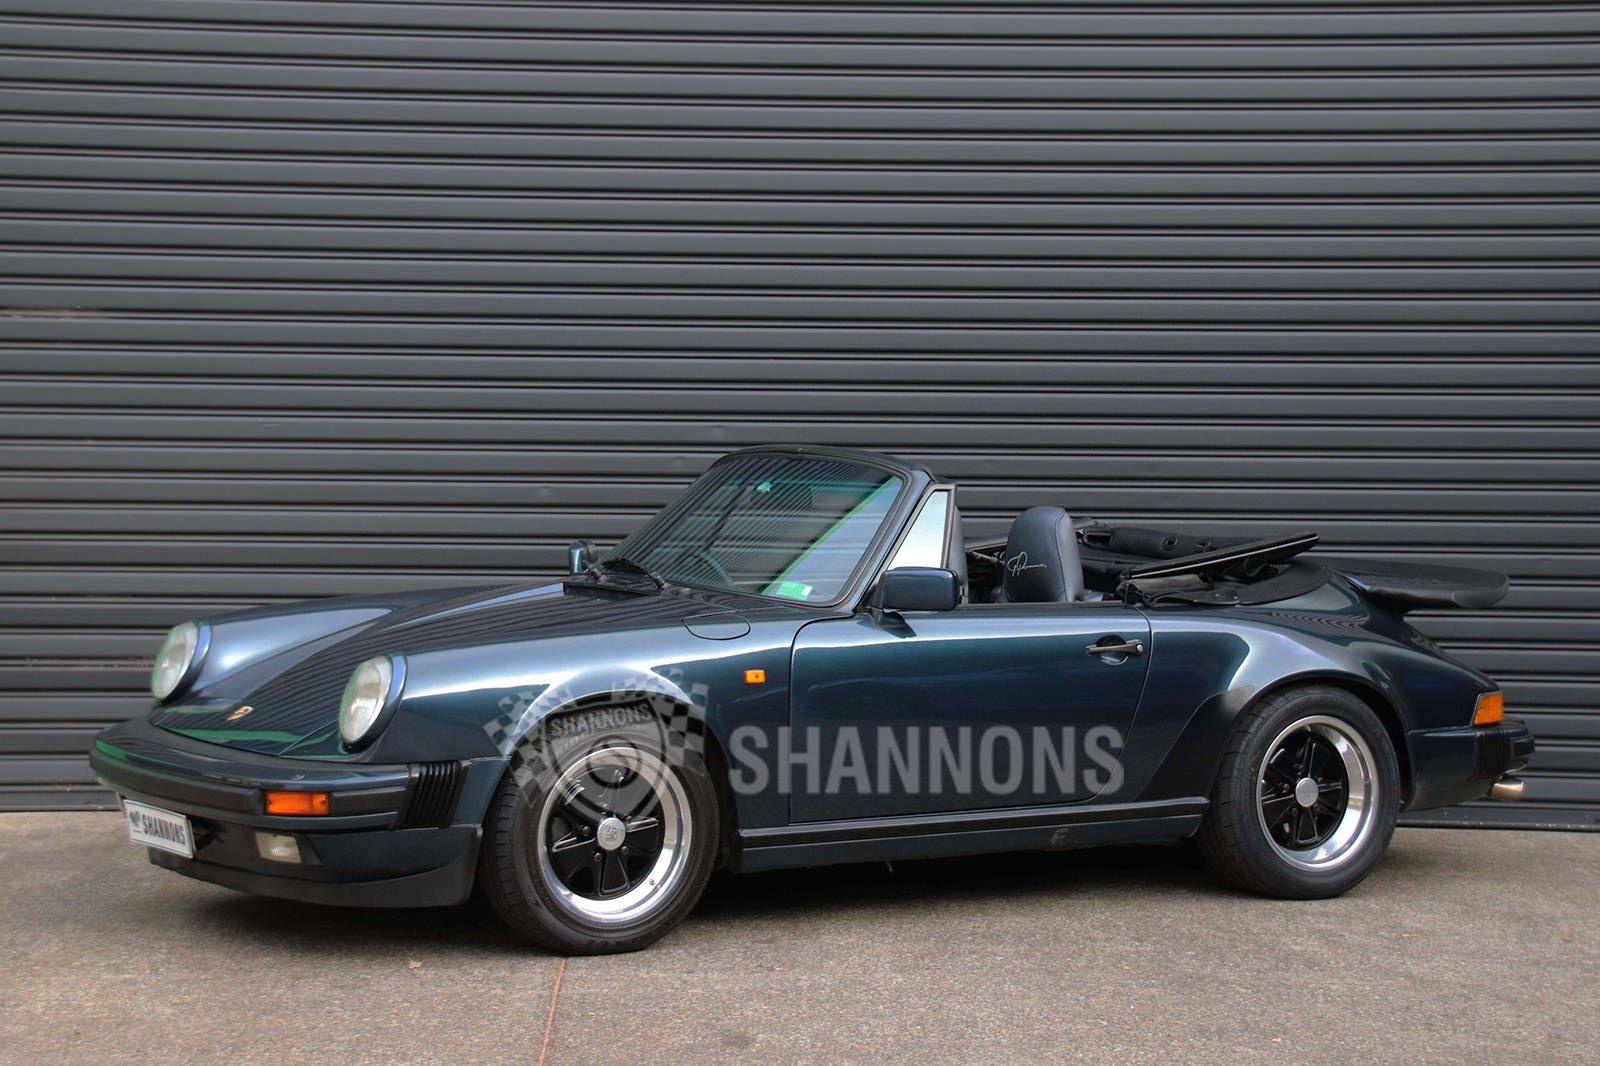 1988 Porsche 911 Carrera 3.2